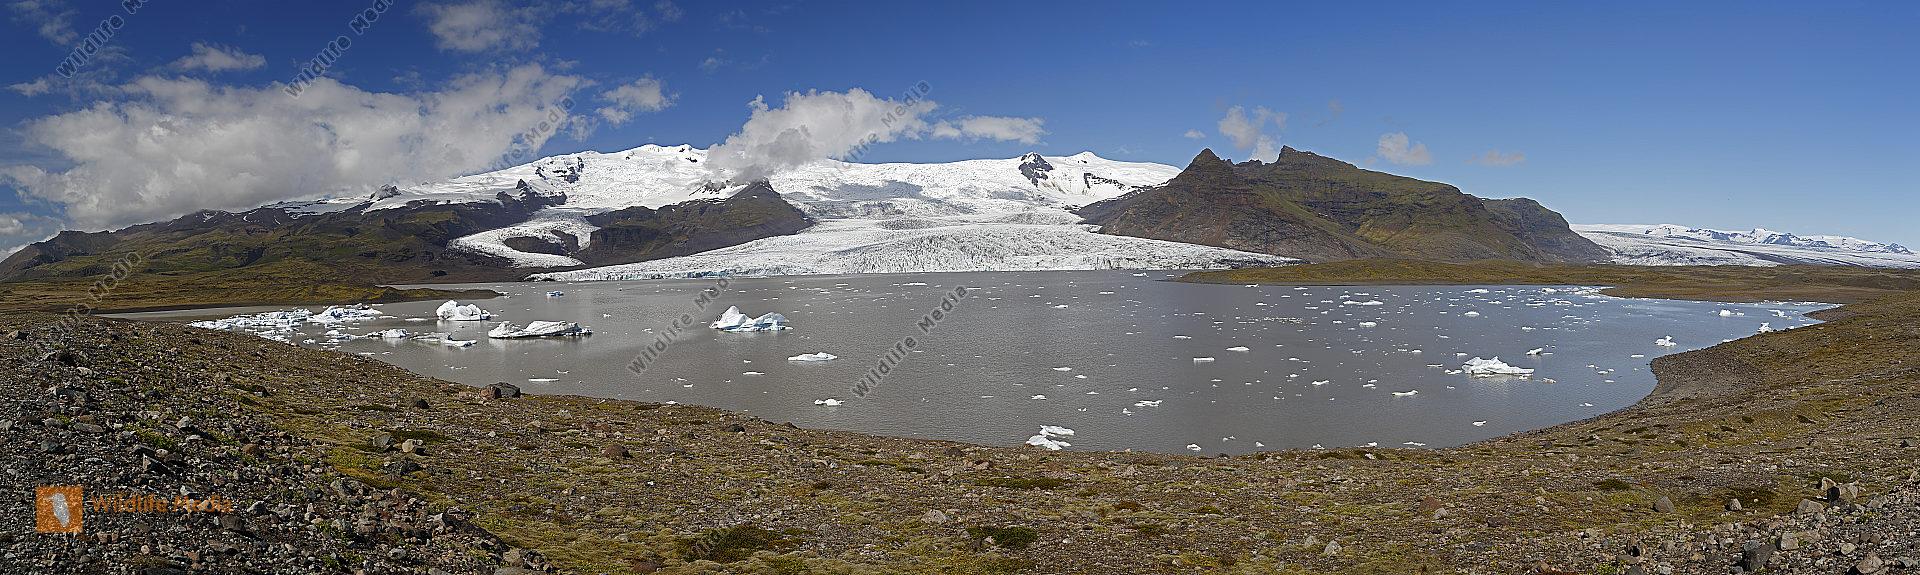 Breidarlon Gletschersee Panorama